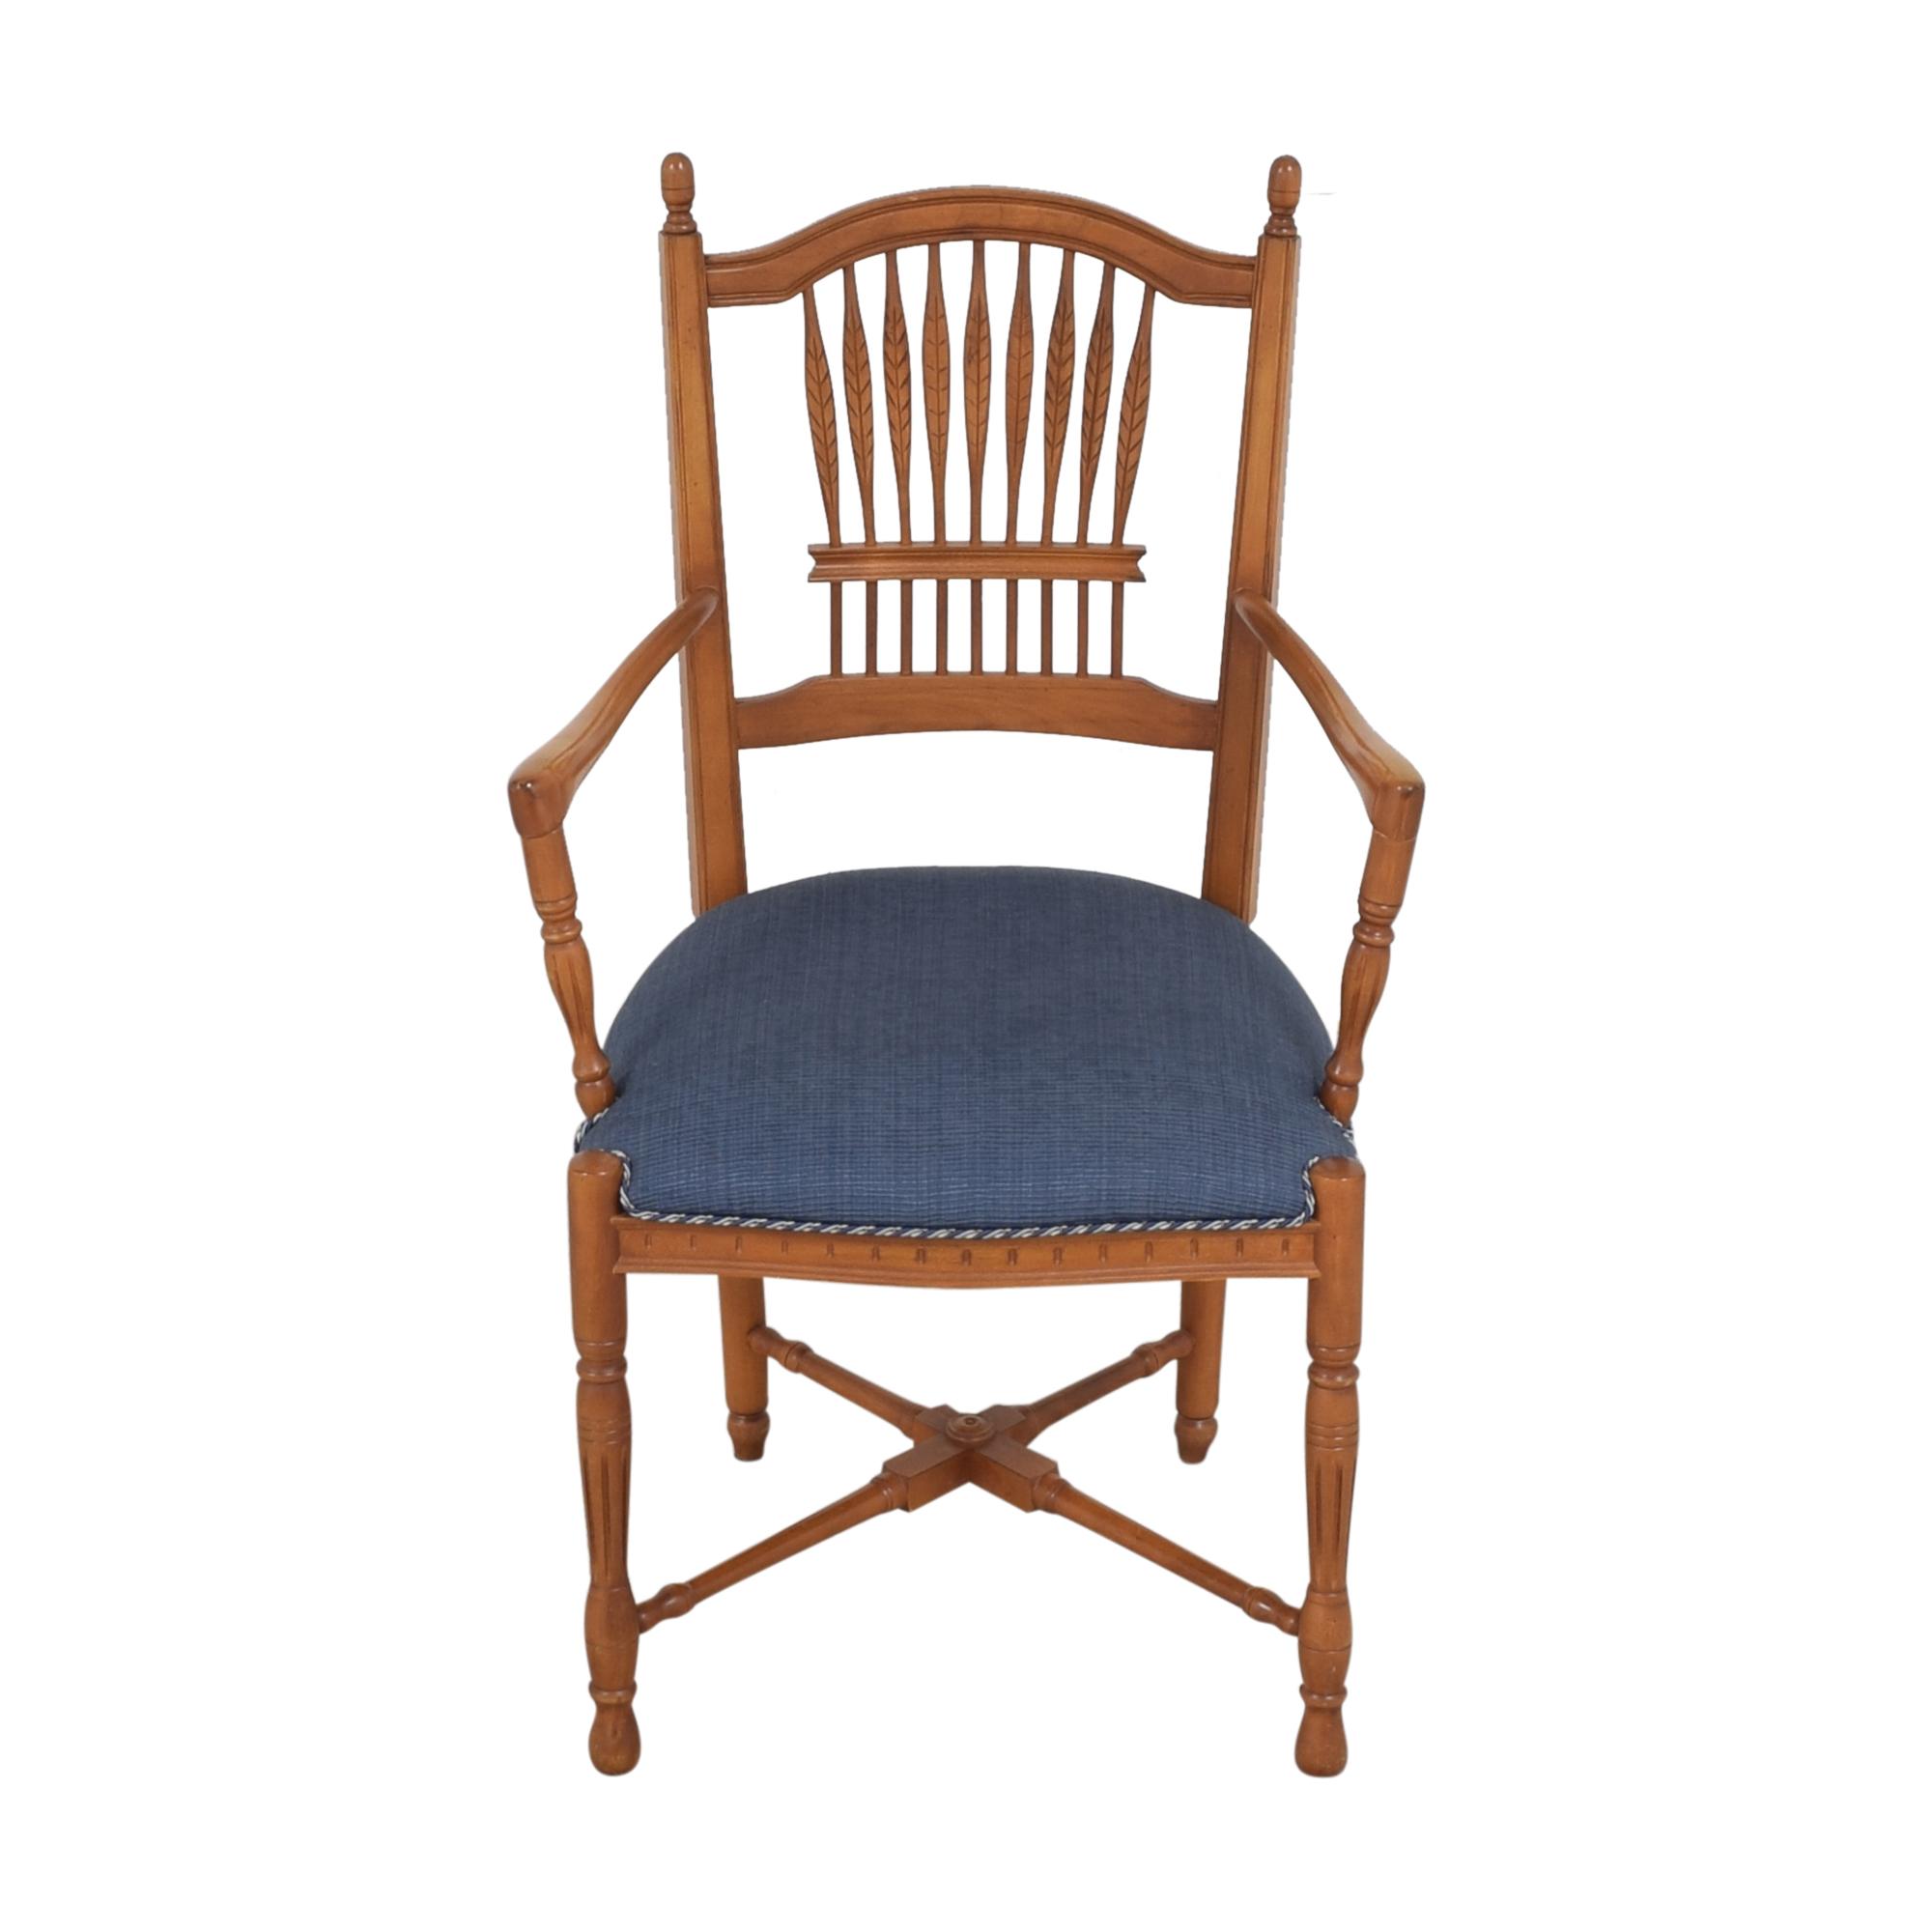 Ethan Allen Ethan Allen Wheatback Chair for sale